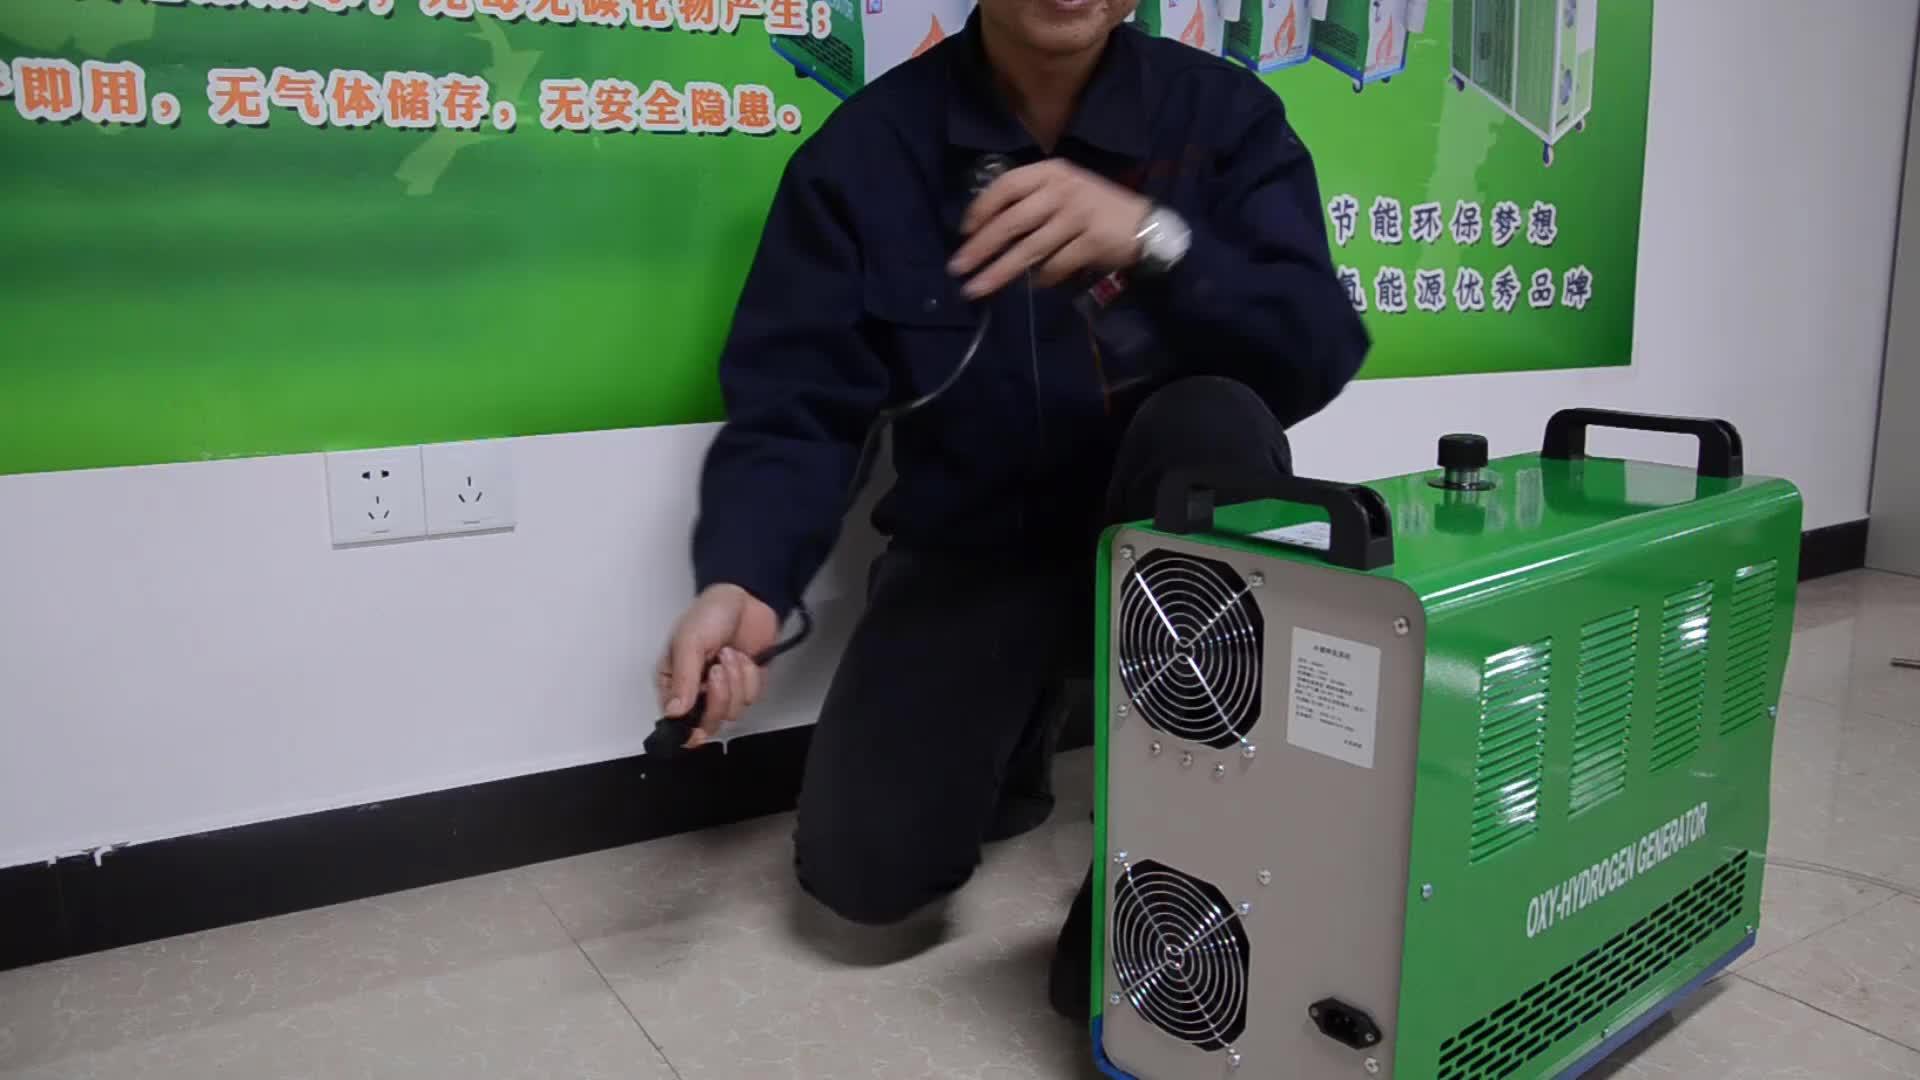 OH100-OH600 Top1 Portable Hho OXY Hidrogen Harga Generator untuk Pengelasan